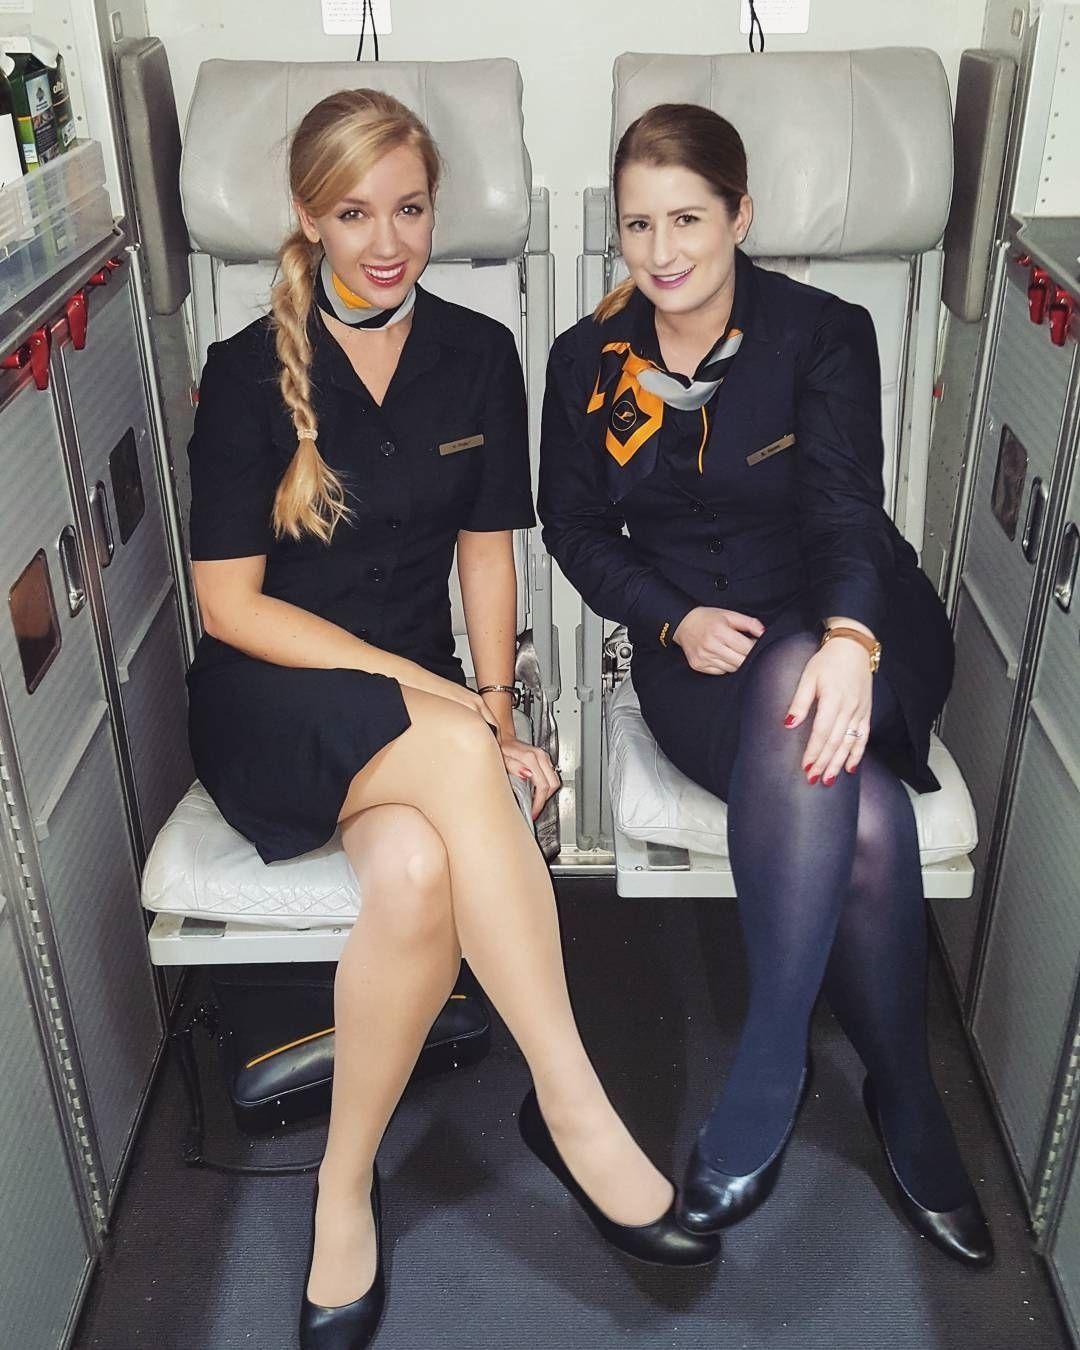 Pantyhose on a plane